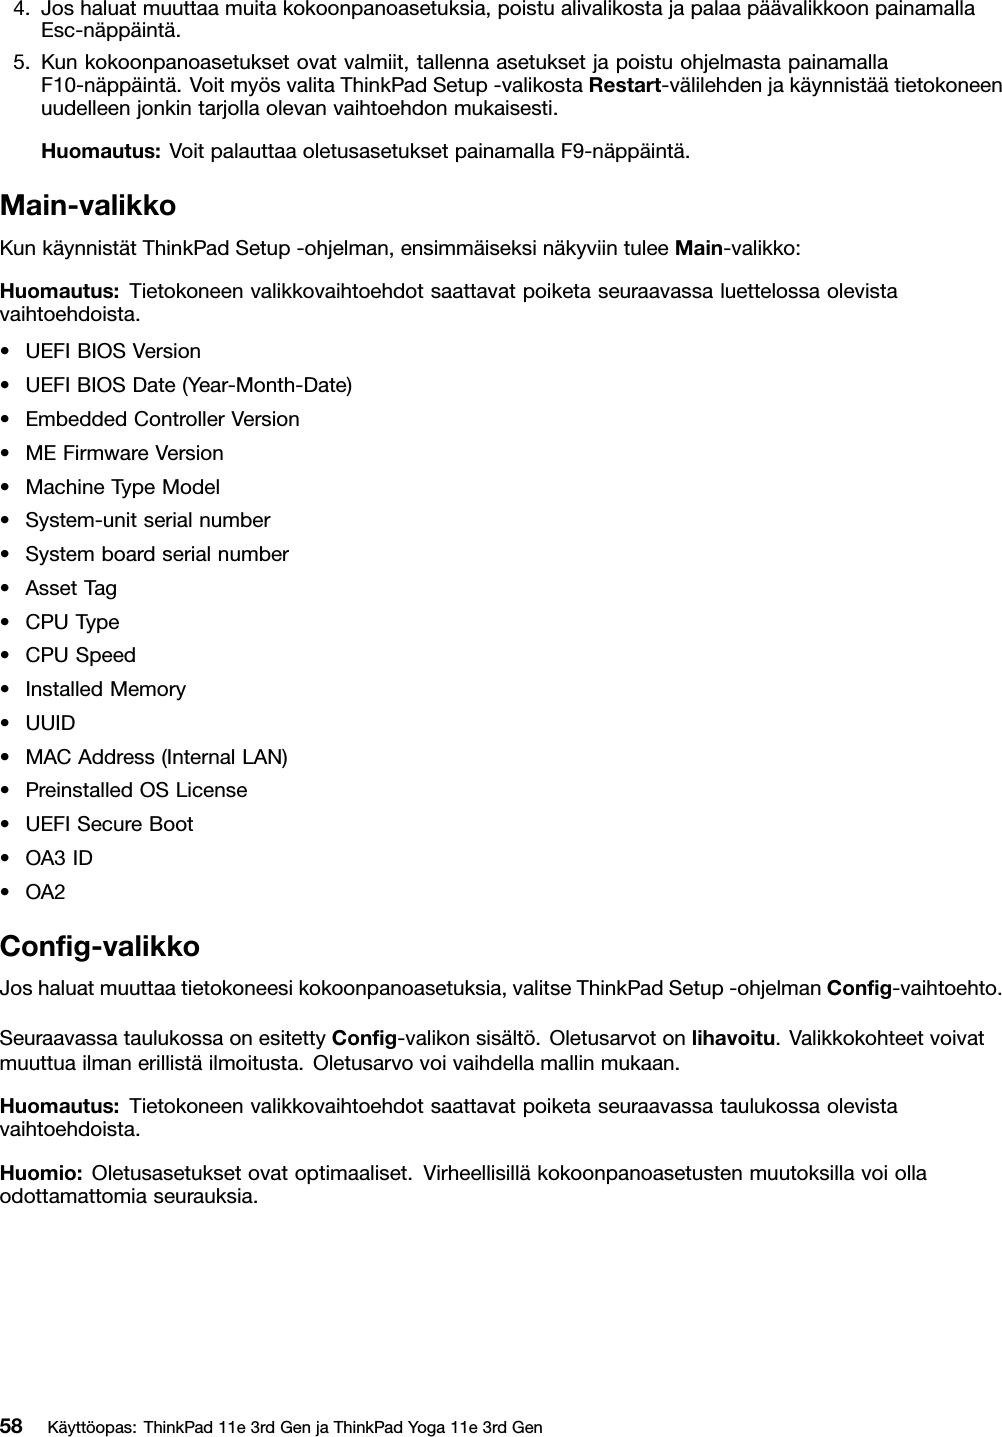 Lenovo 11E Yoga11E Gen3 Ug Fi (Finnish) User Guide ThinkPad (Type